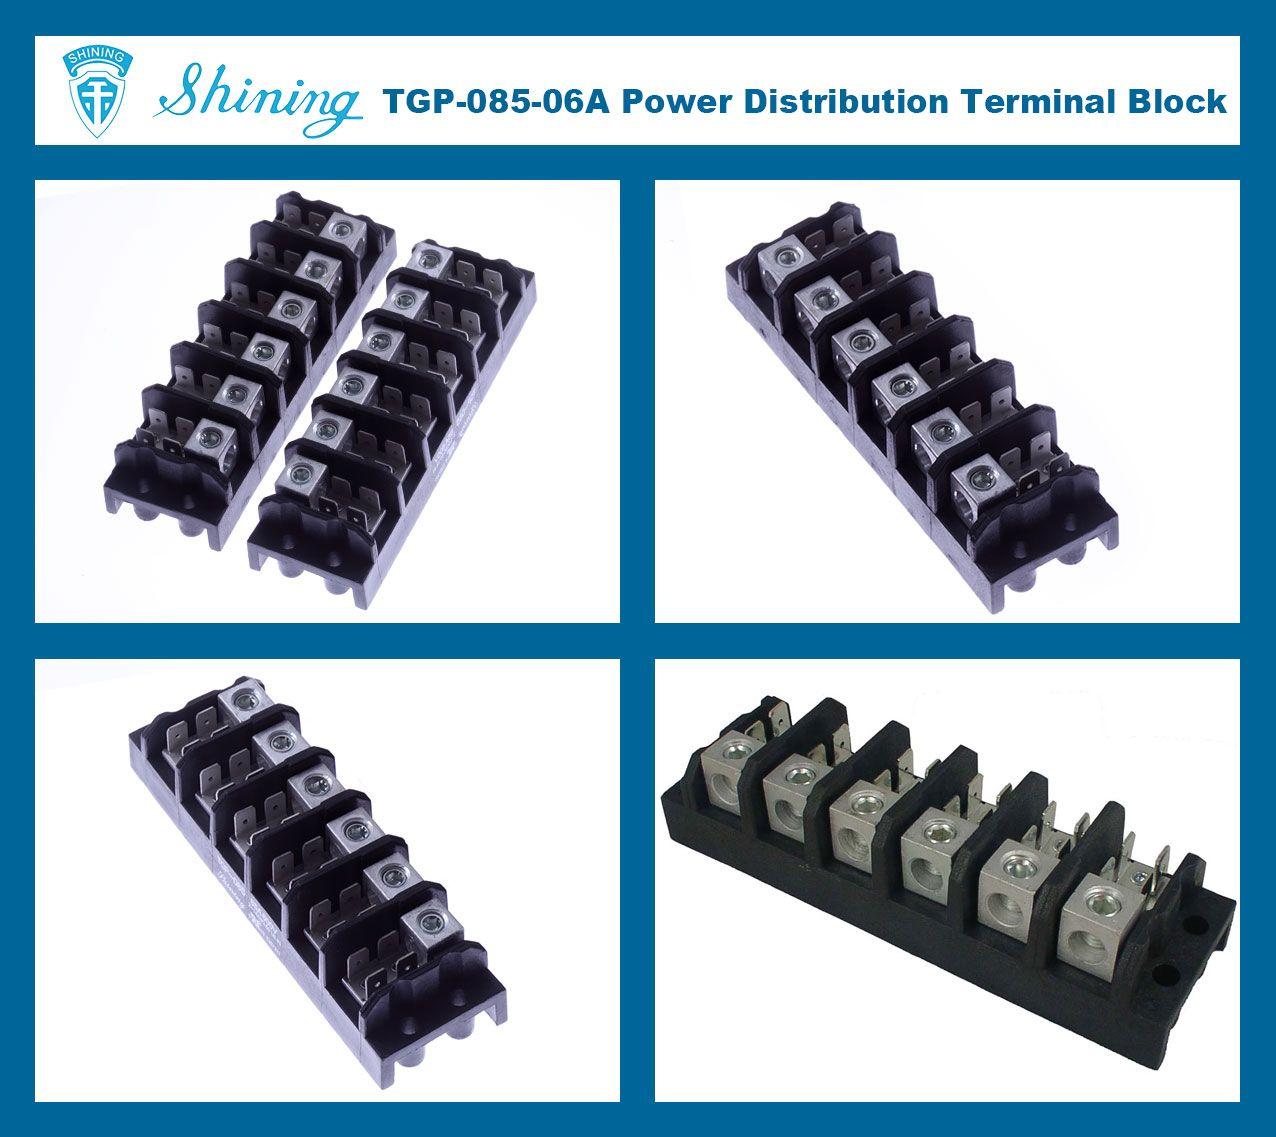 SHINING-TGP-085-06A 600V 85A 6 Pole Electrical Power Terminal Block